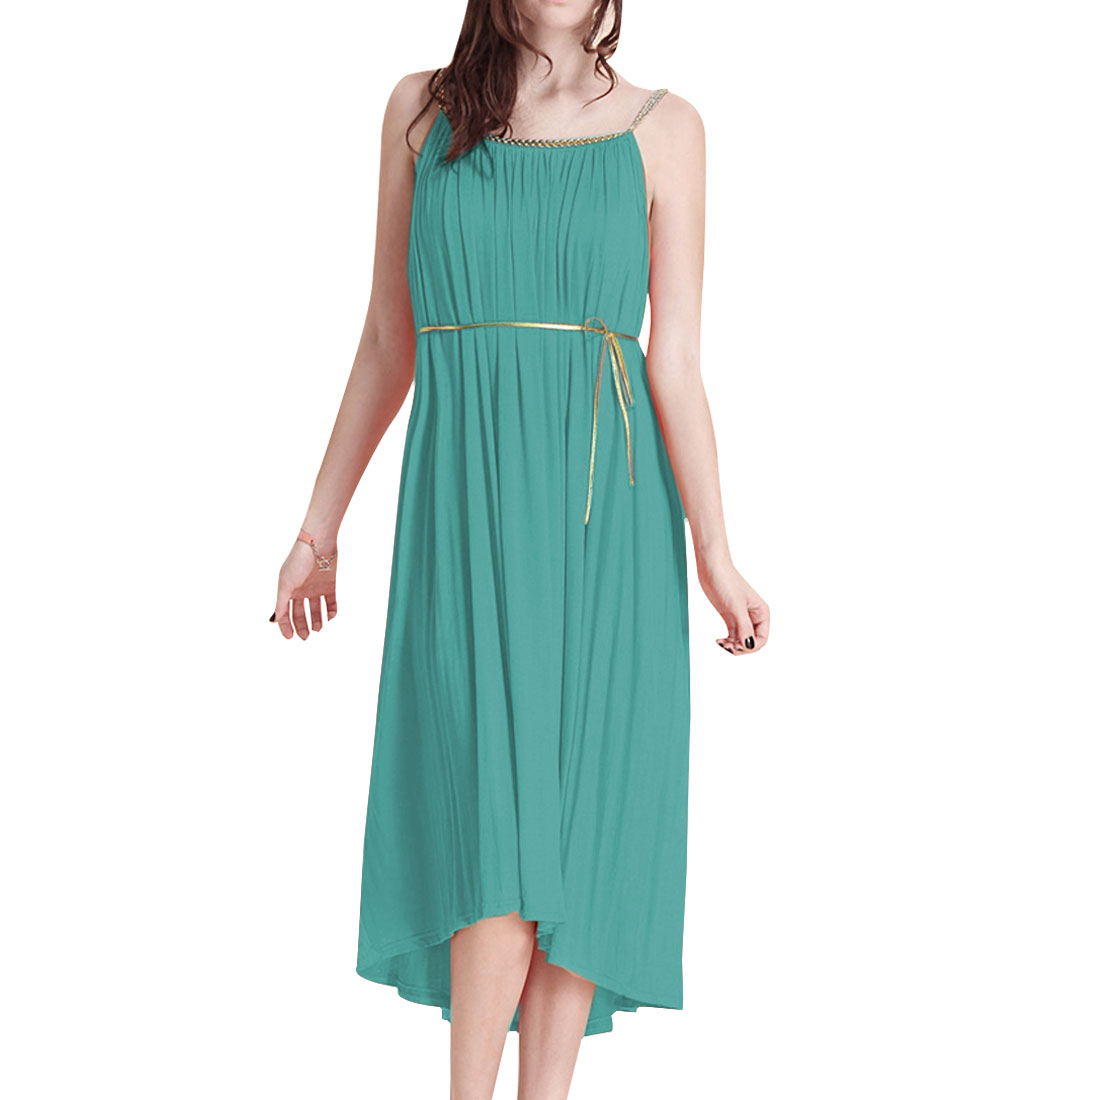 Lady Summer Sleeveless Half Backless Aqua Pleated Dress M